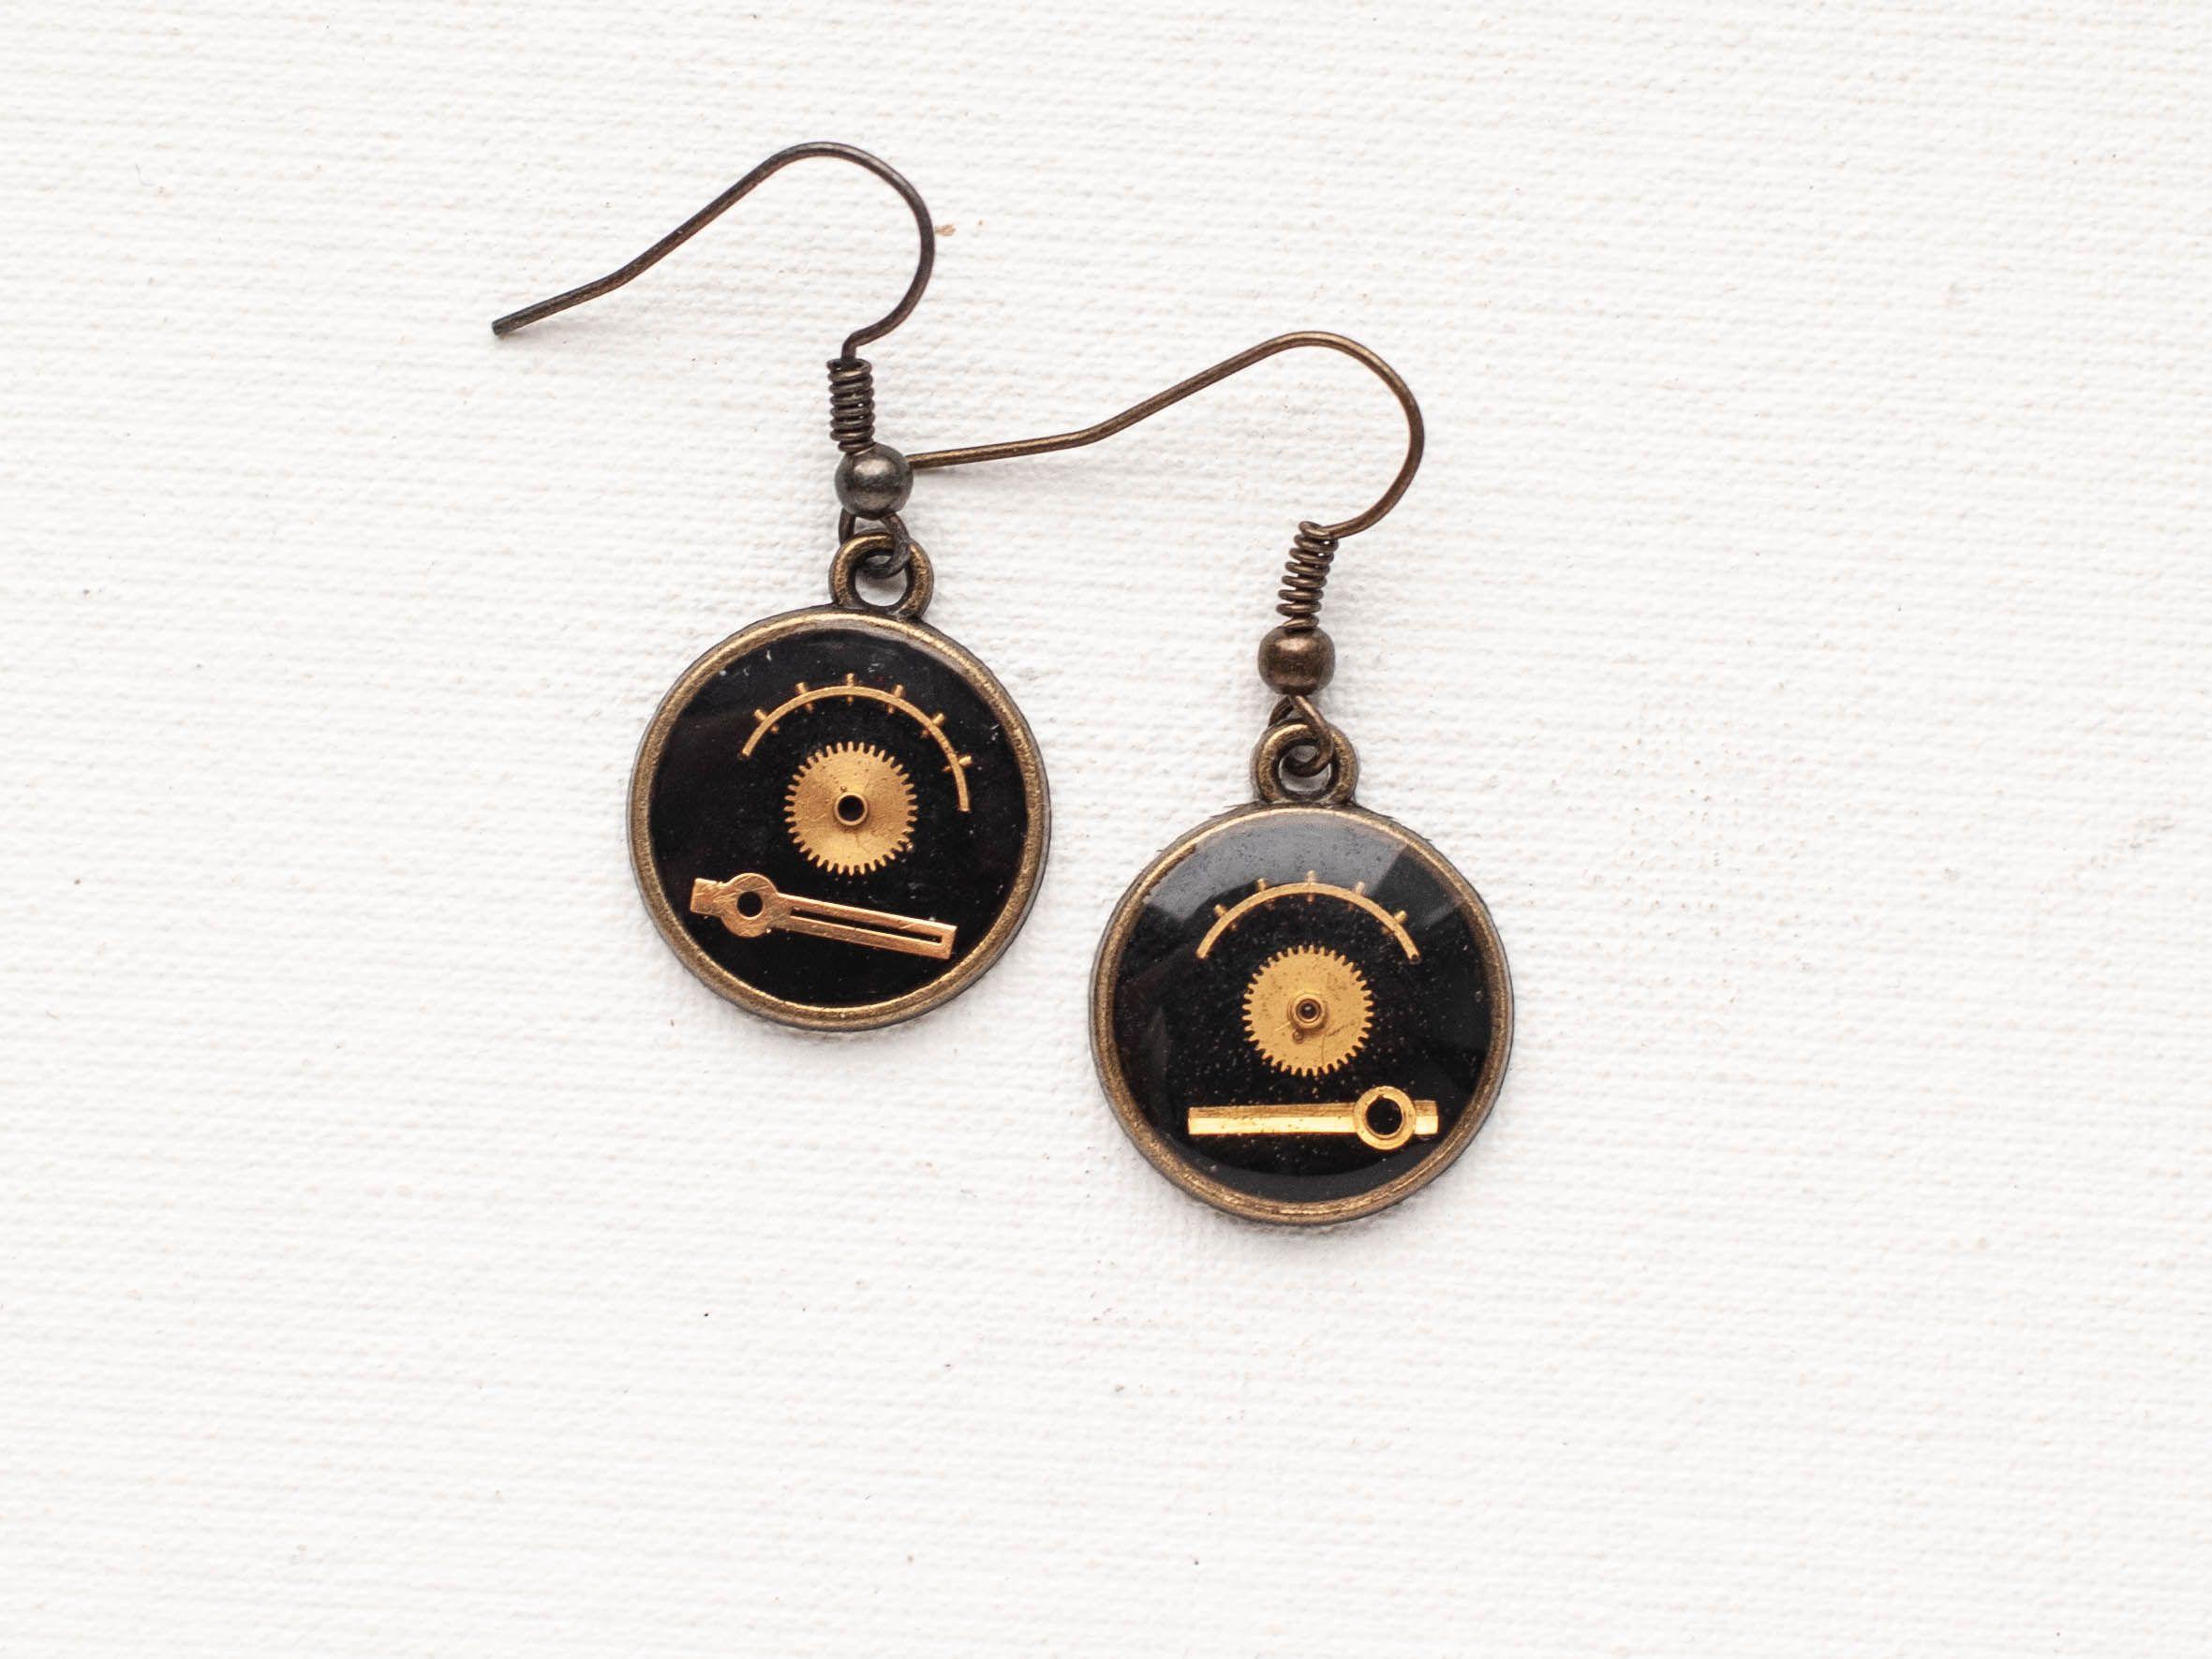 Cute epoxy resin earrings made by Boomyland  Steampunk